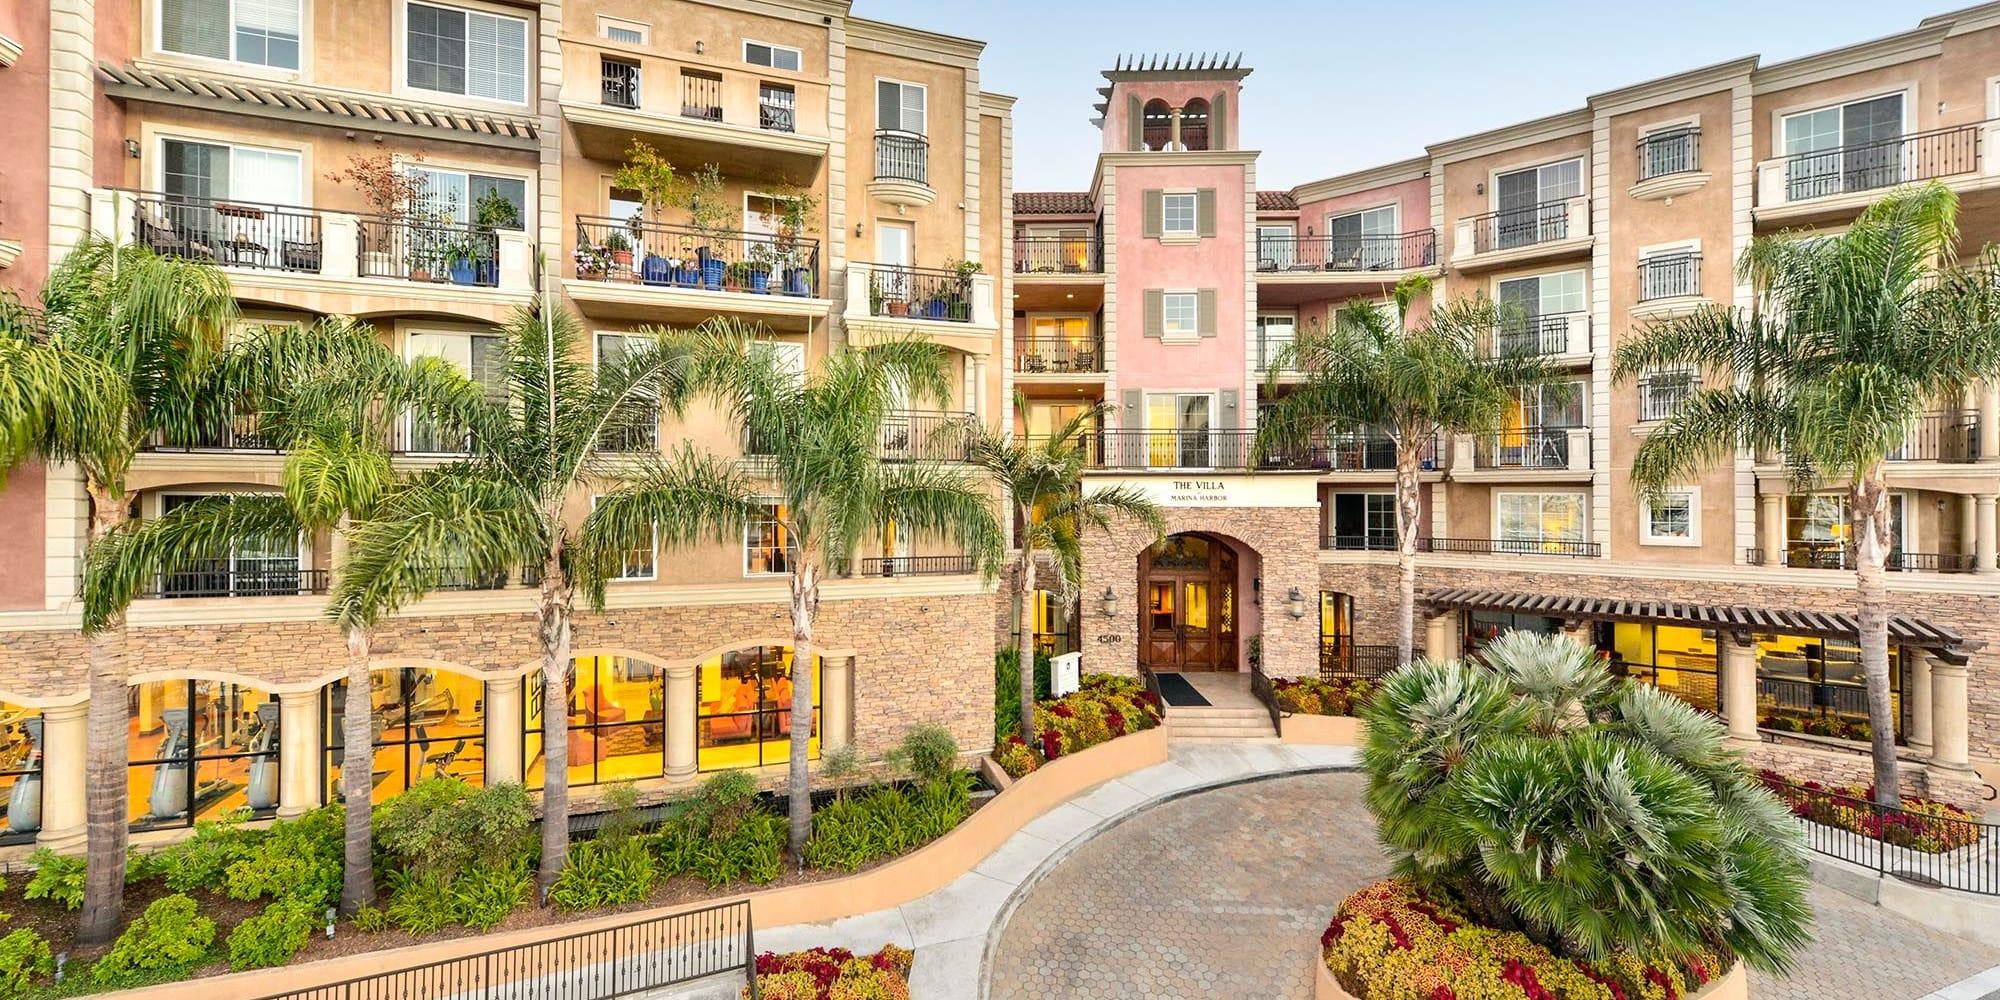 View of our villa-style luxury community at The Villa at Marina Harbor in Marina del Rey, California